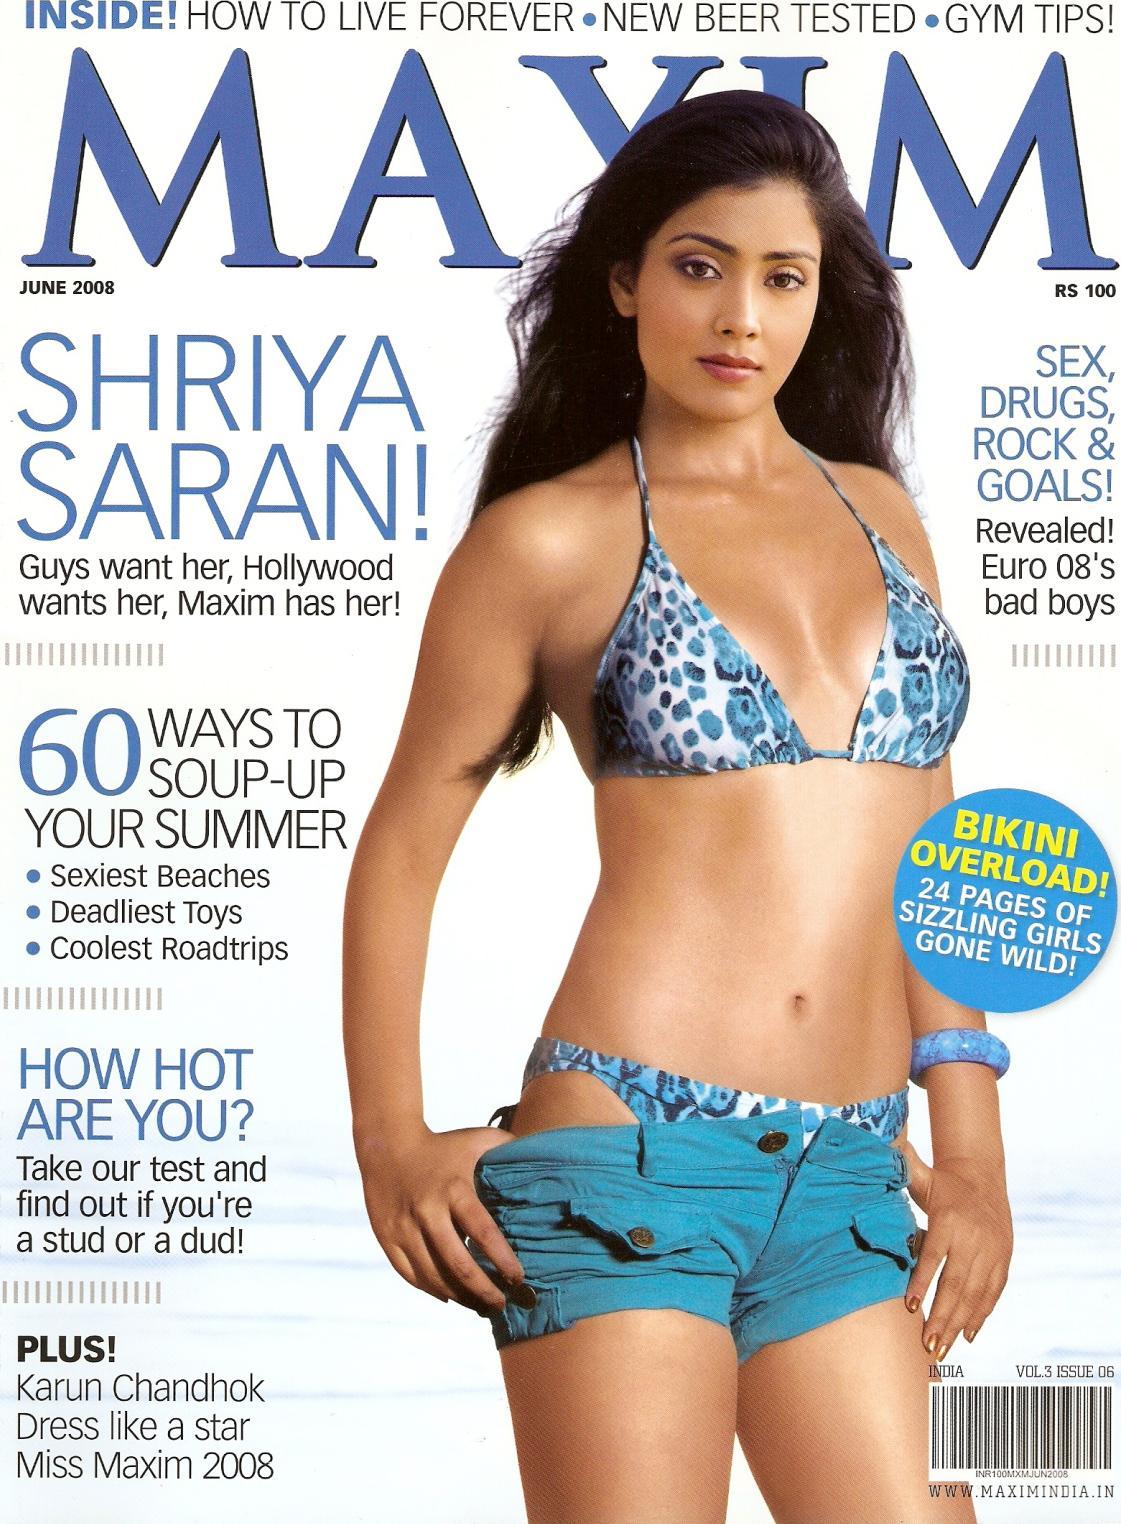 Bikini Pics: Maxim Cover featuring Shriya Saran